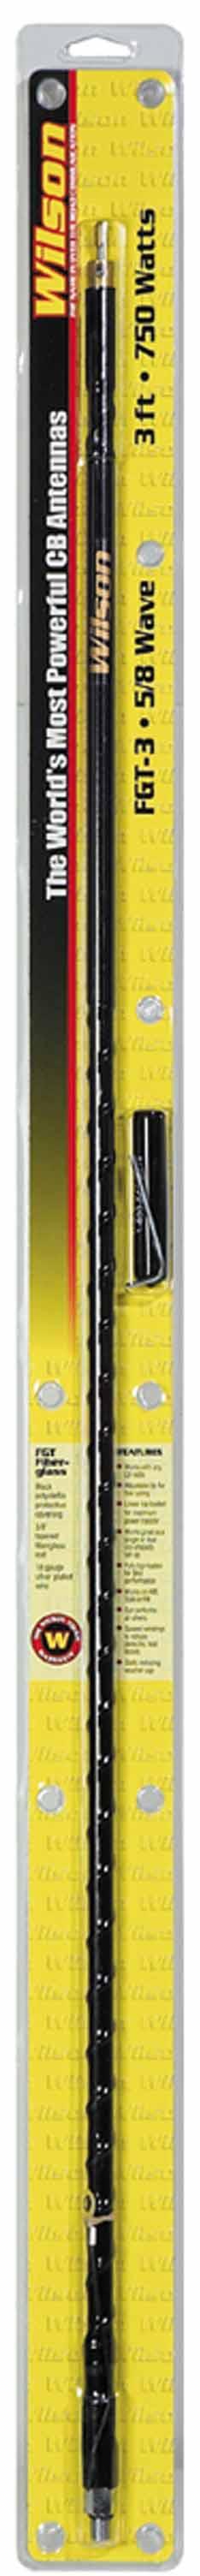 WFGT3-B - Wilson 3' Tunable Tip CB Antenna (Black) w/Ground Strap, Silver Load